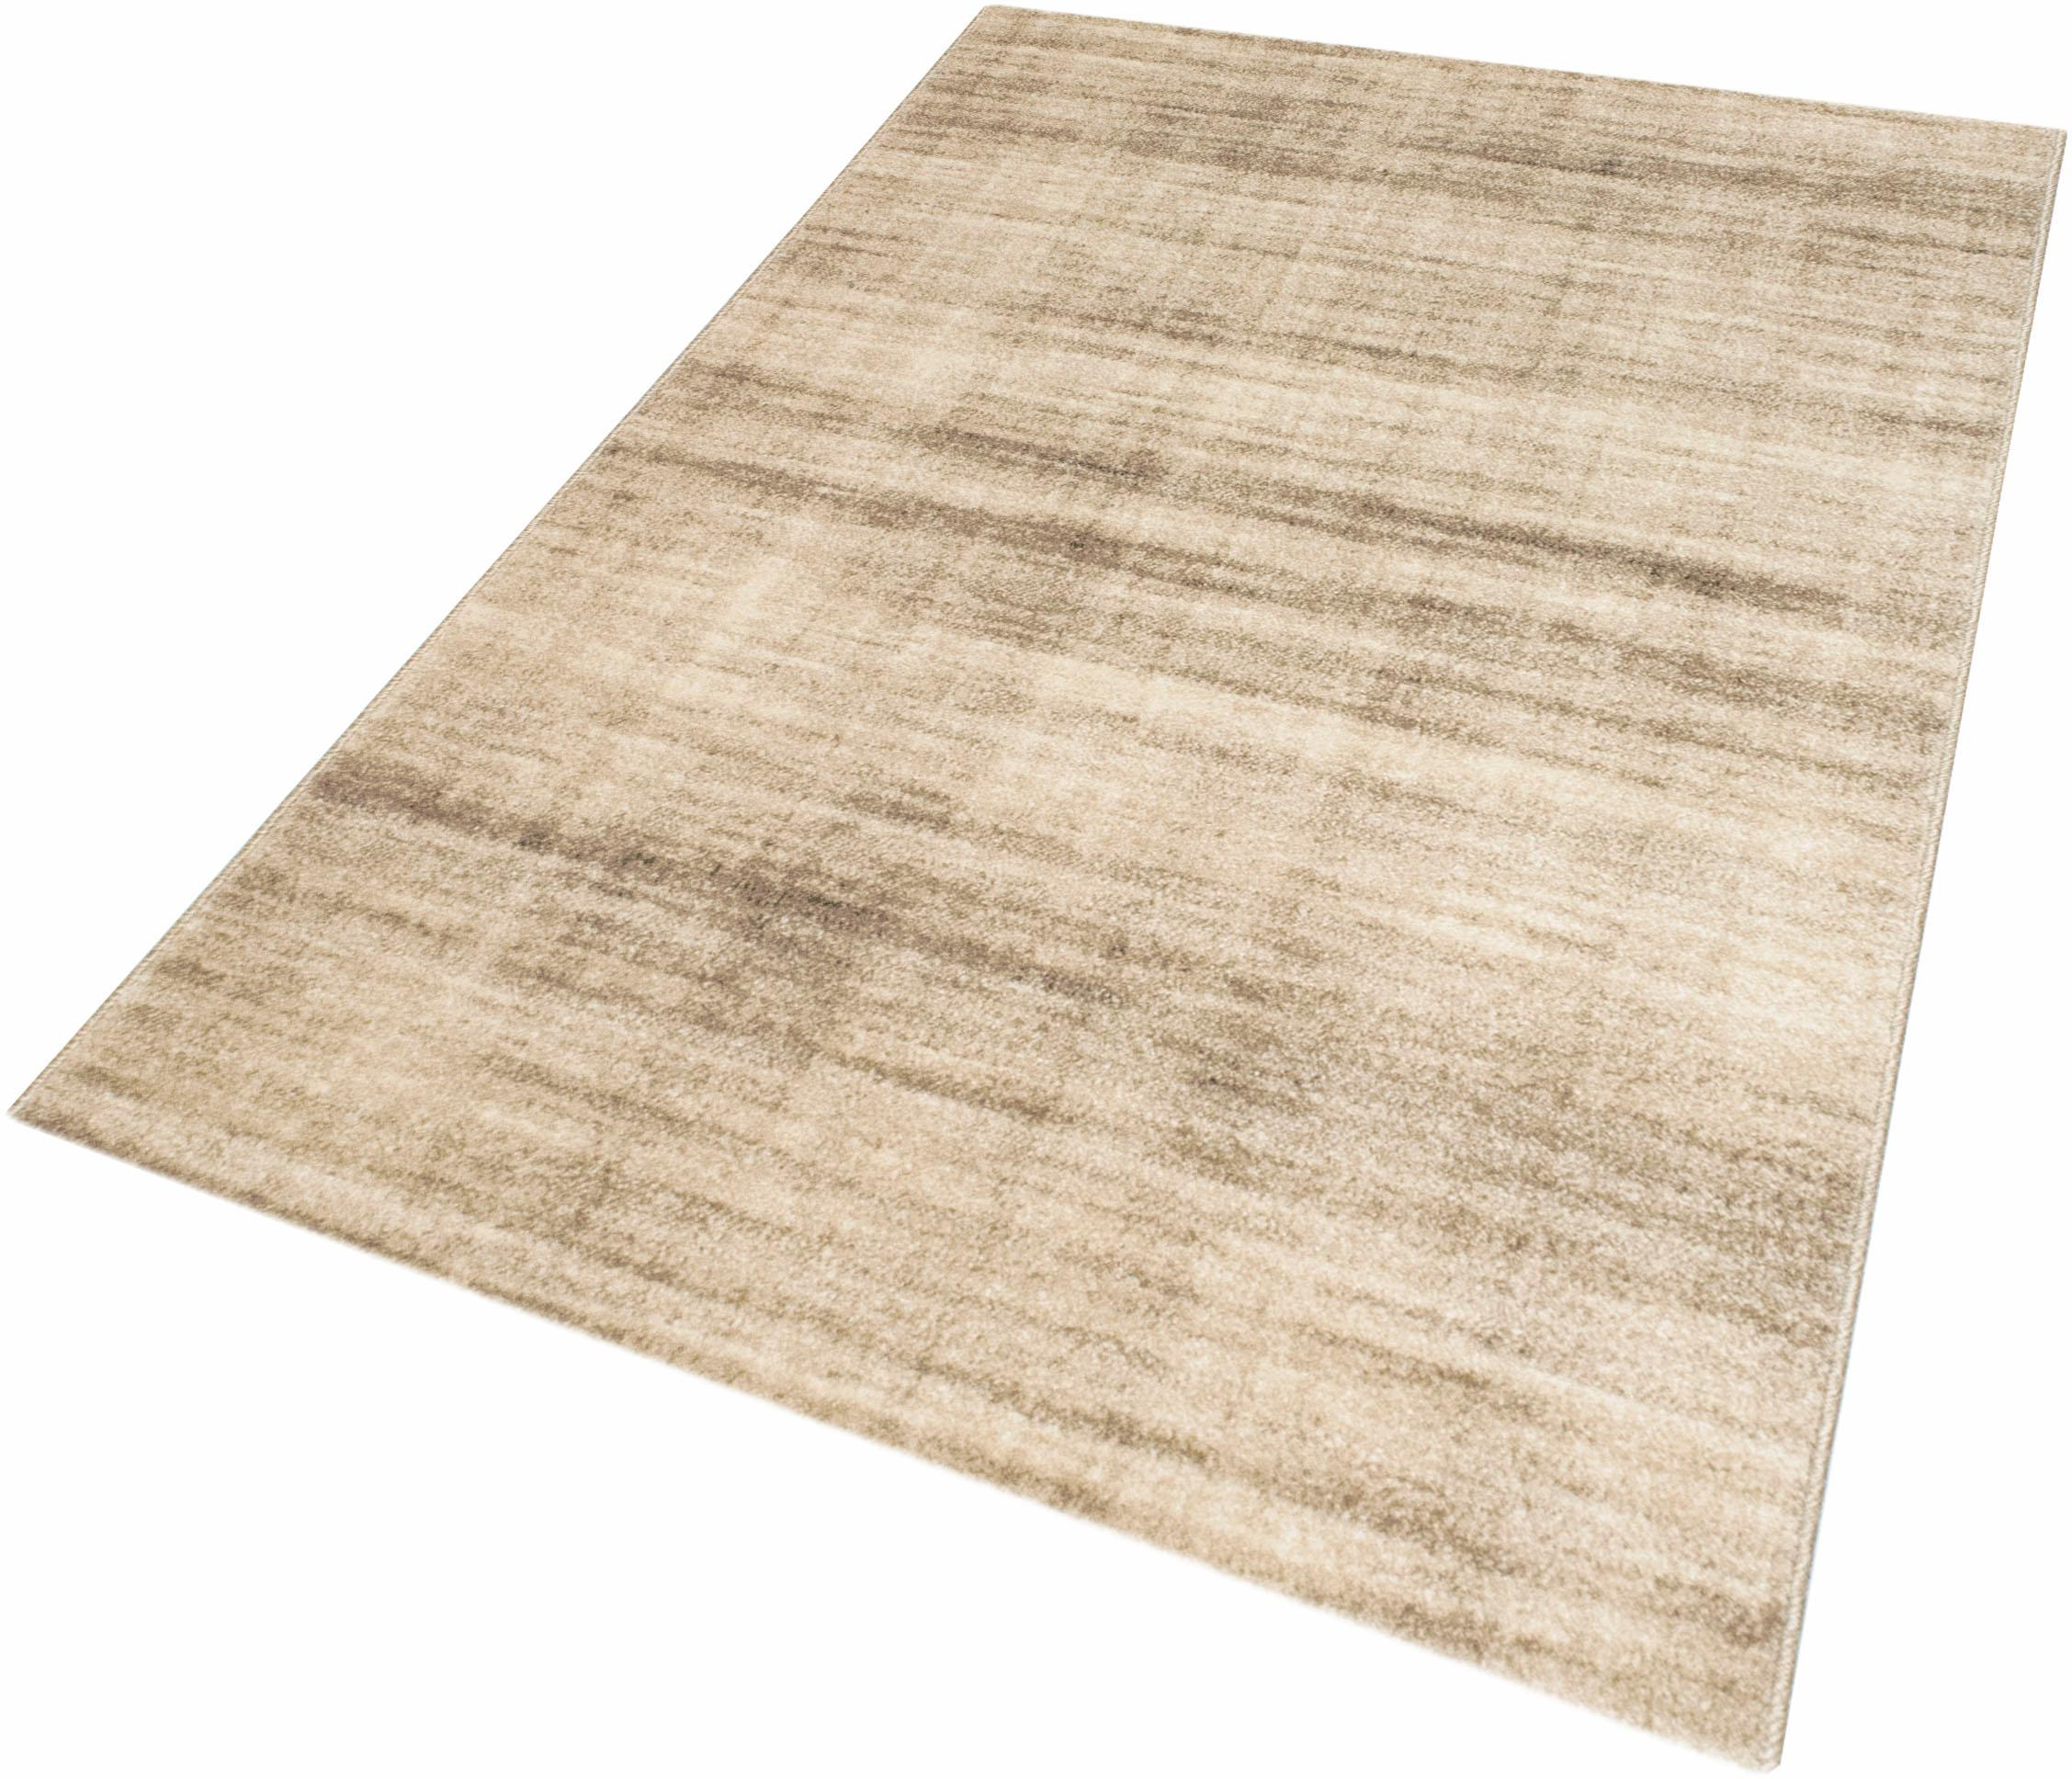 Teppich Pienza 11582 Festival rechteckig Höhe 9 mm maschinell gewebt